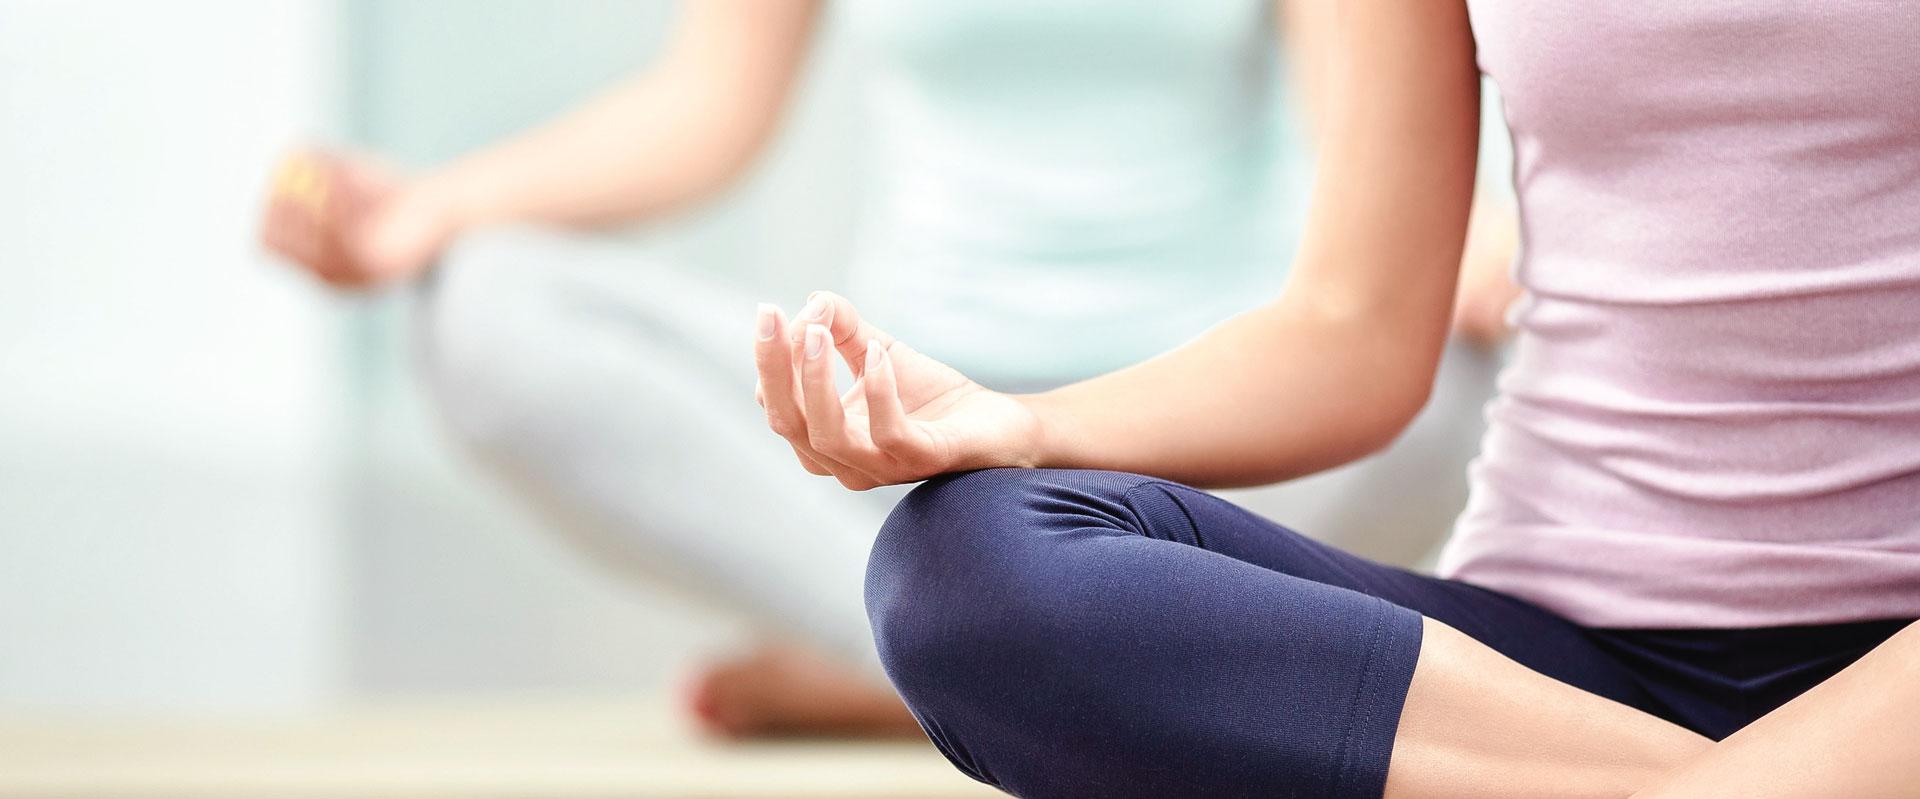 Bewegte Rückbildung nach Pilates und Yoga